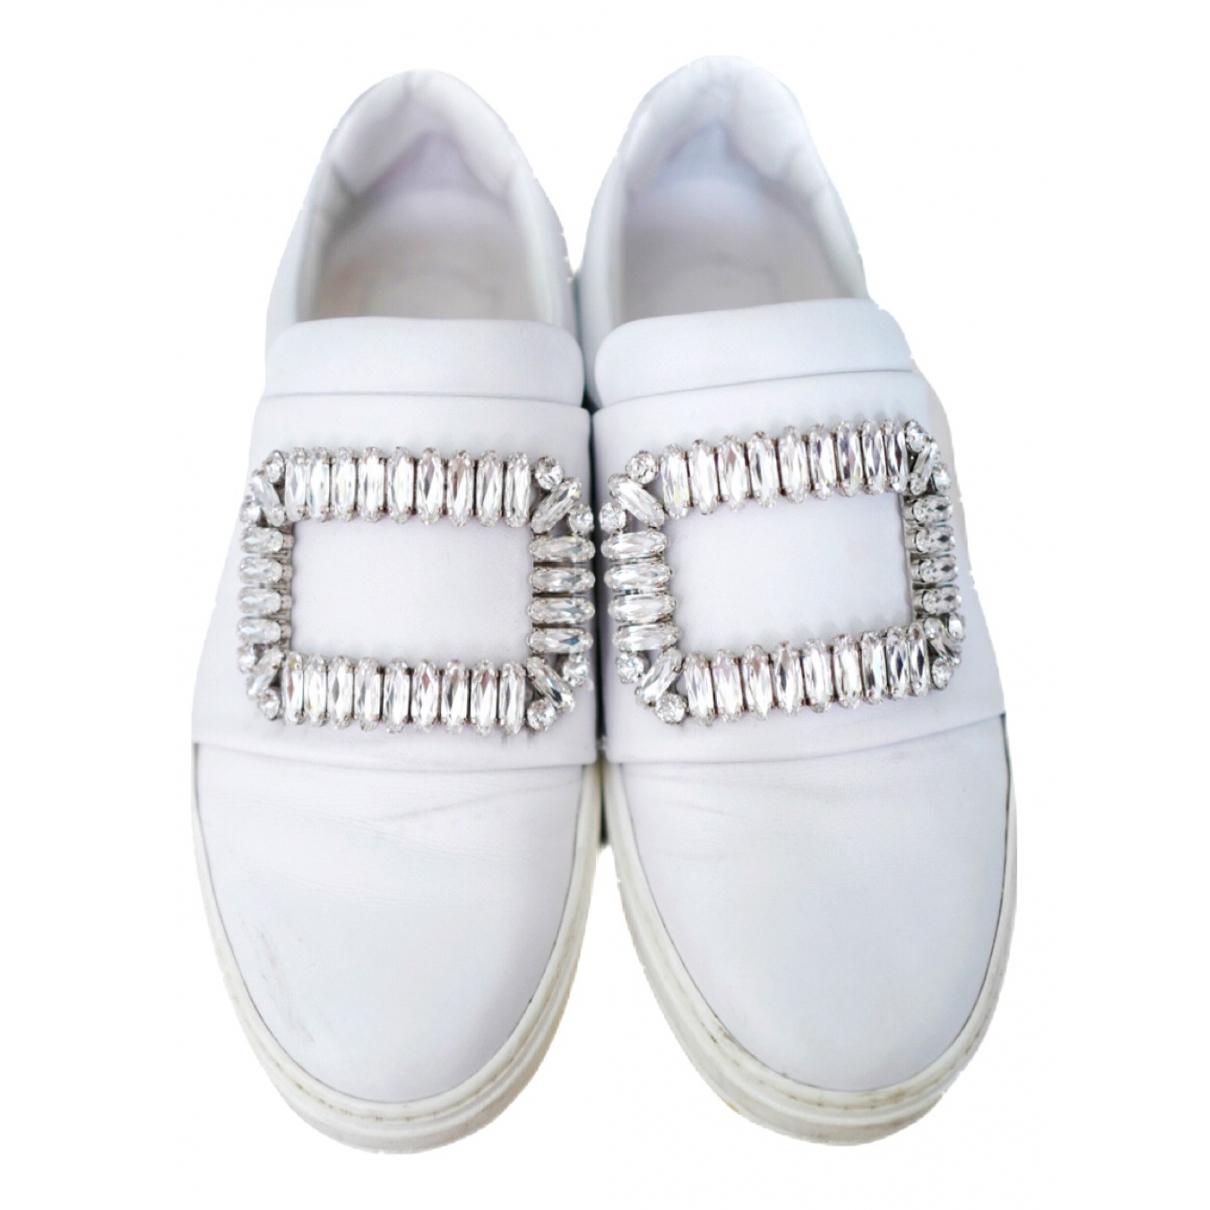 Roger Vivier Sneaky Viv Strass Buckle Sneakers in  Weiss Leder